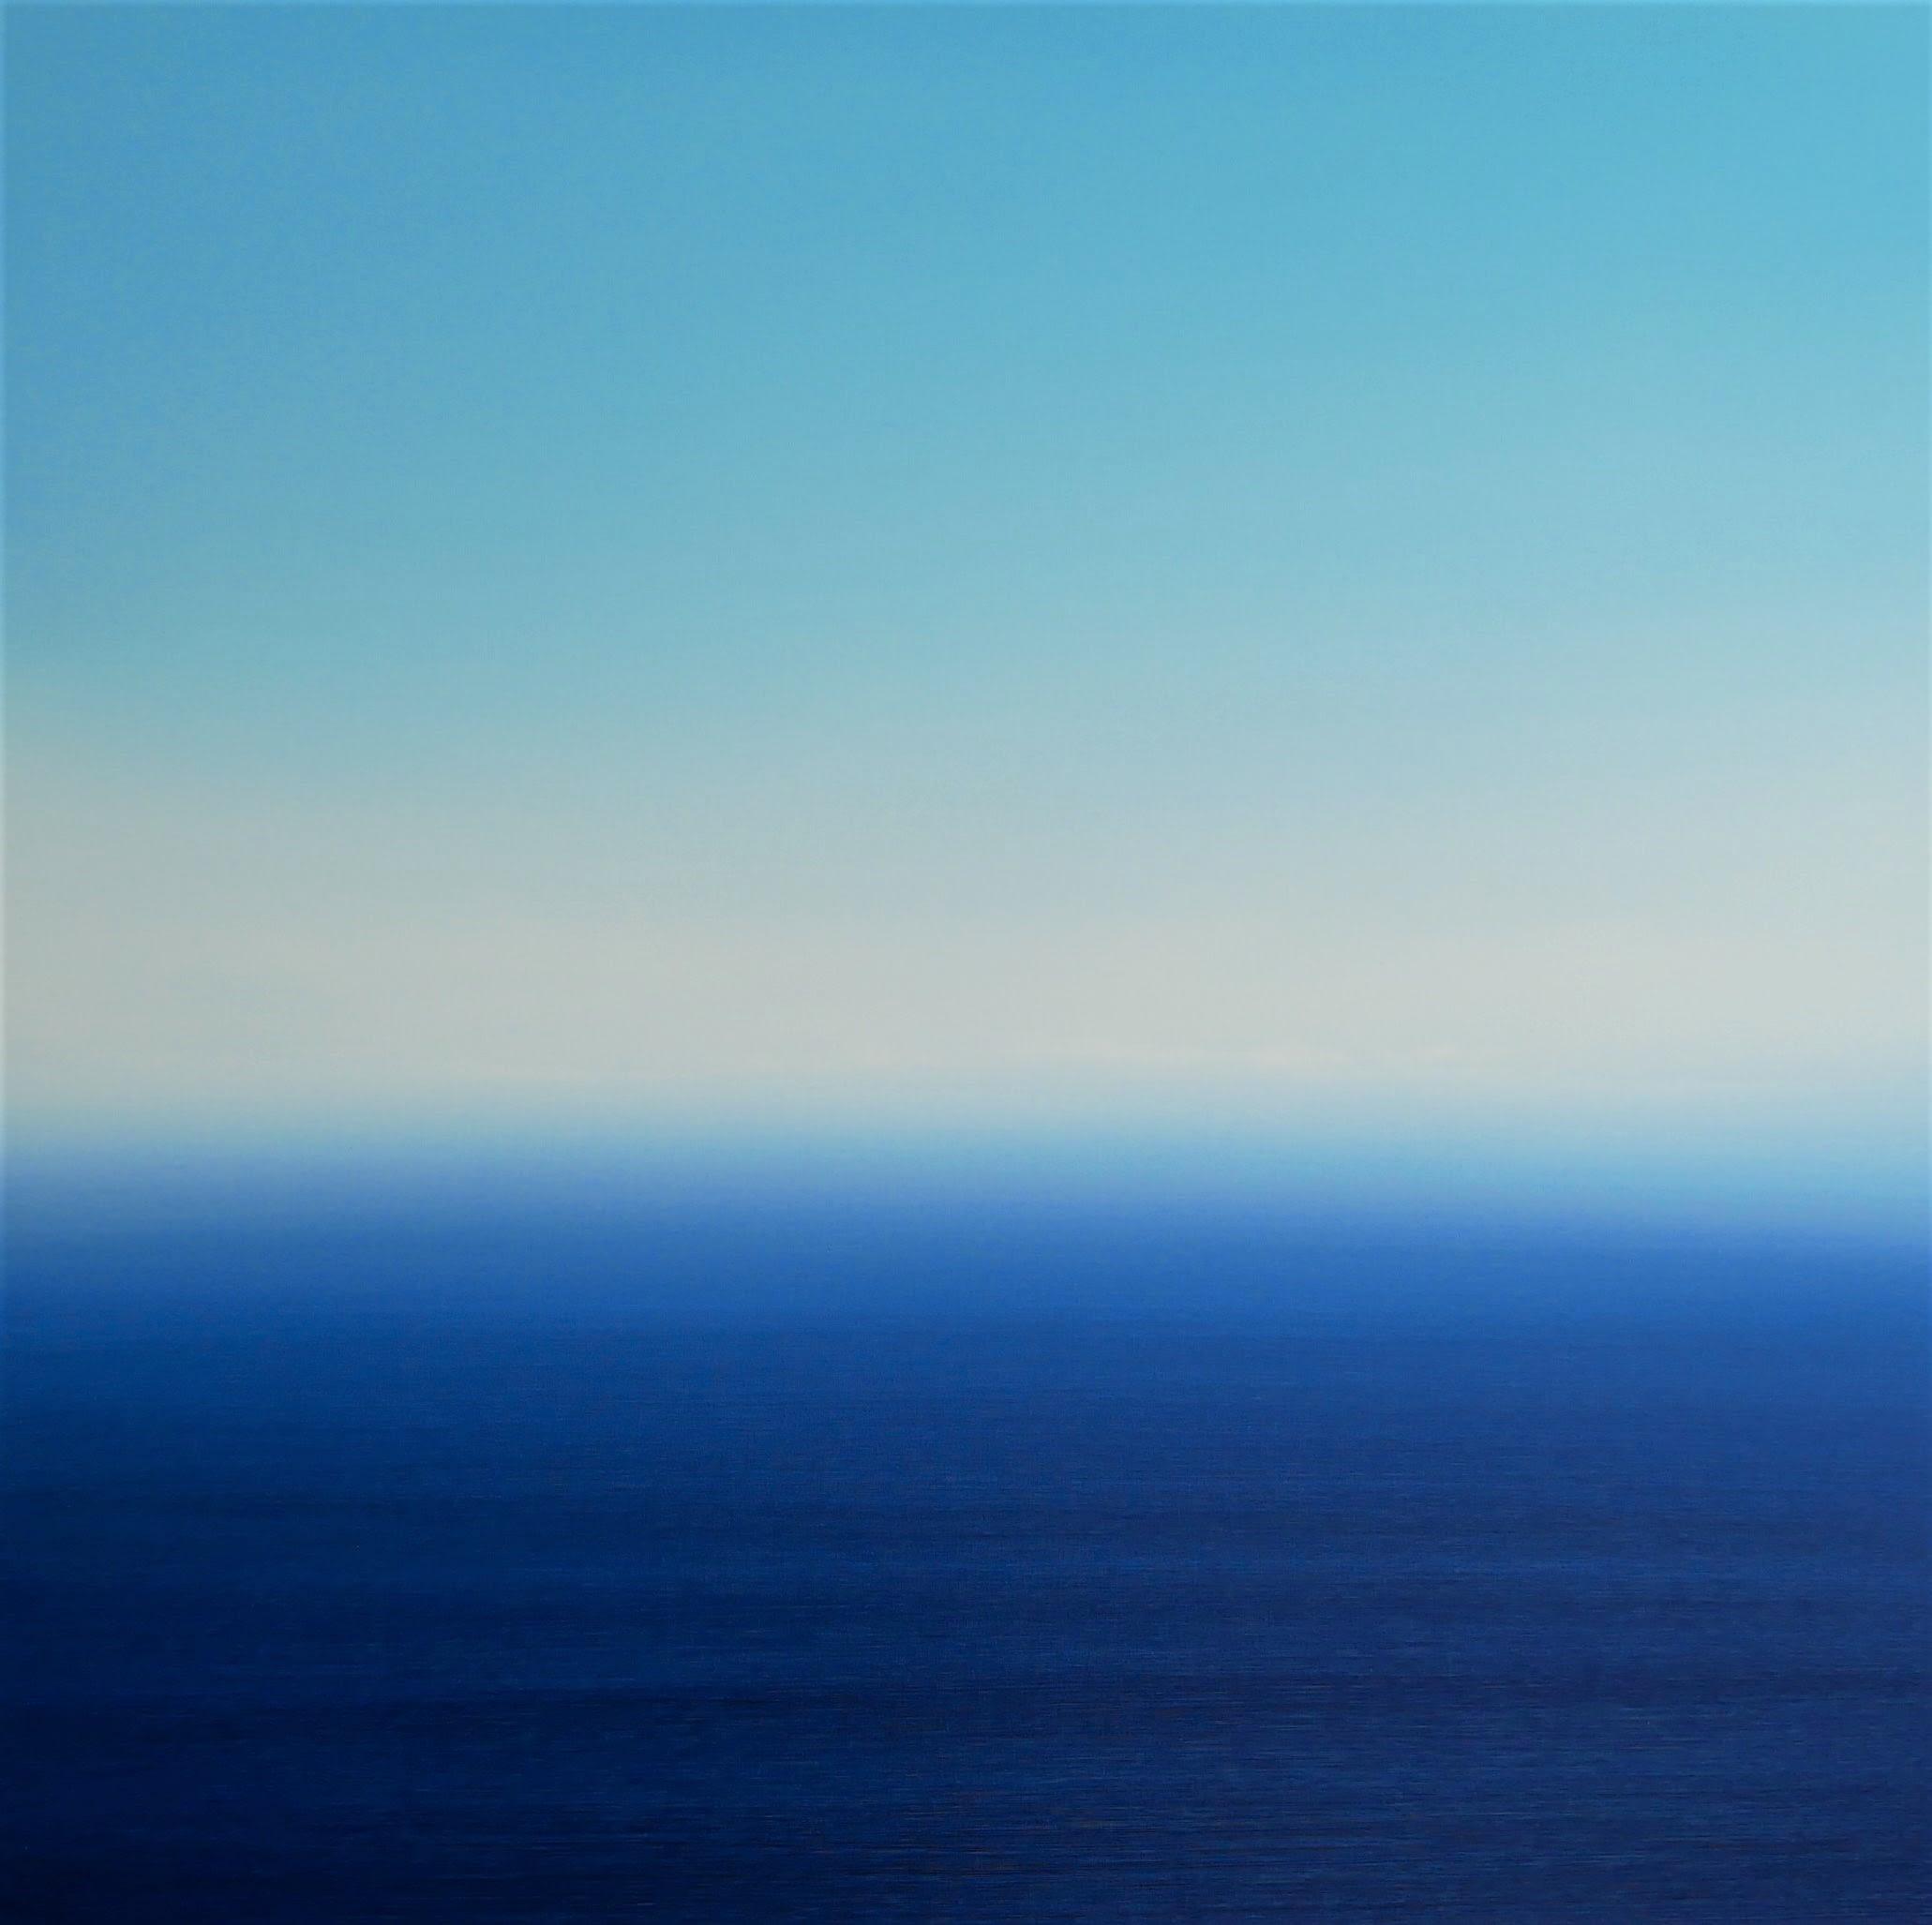 "<span class=""link fancybox-details-link""><a href=""/artists/78-martyn-perryman/works/7752-martyn-perryman-blue-meditations-st-ives-bay-2021/"">View Detail Page</a></span><div class=""artist""><strong>Martyn Perryman</strong></div> b. 1963 <div class=""title""><em>Blue Meditations St Ives Bay</em>, 2021</div> <div class=""medium"">oil on canvas<br /> framed</div> <div class=""dimensions"">h. 80 x w. 80 cm </div><div class=""copyright_line"">Ownart: £120 x 10 Months, 0% APR</div>"